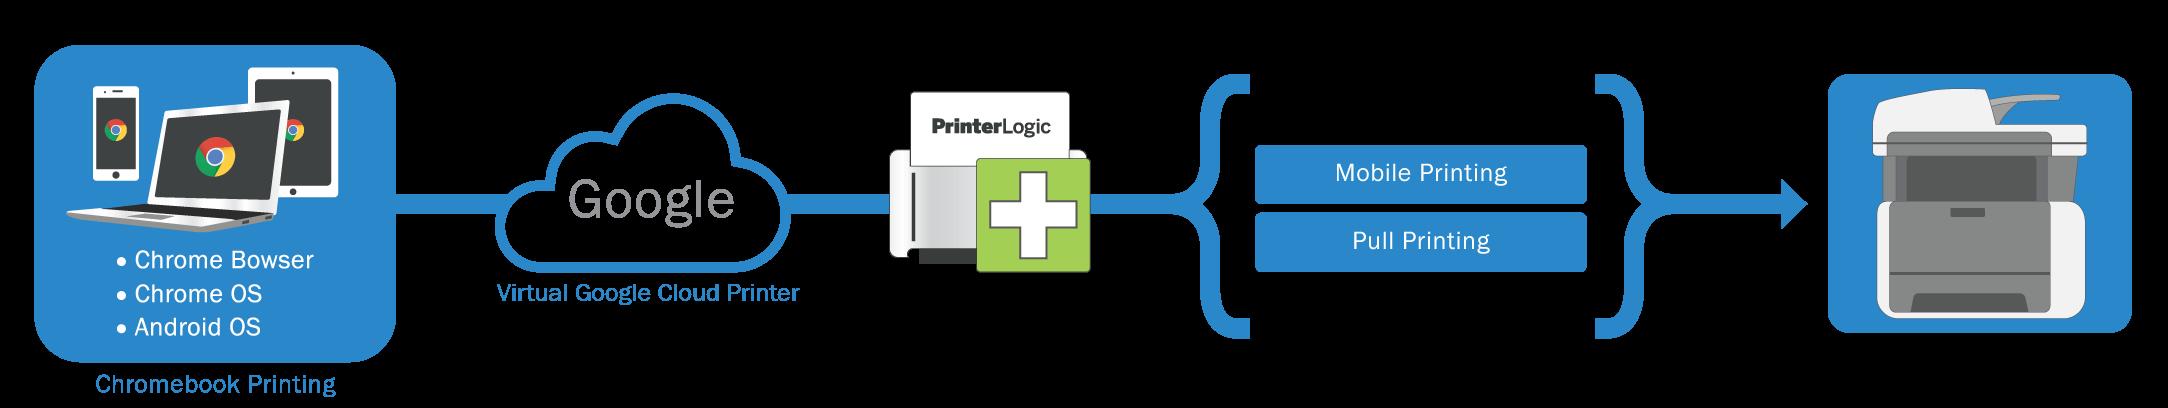 Imprimer via un Chromebook avec PrinterLogic